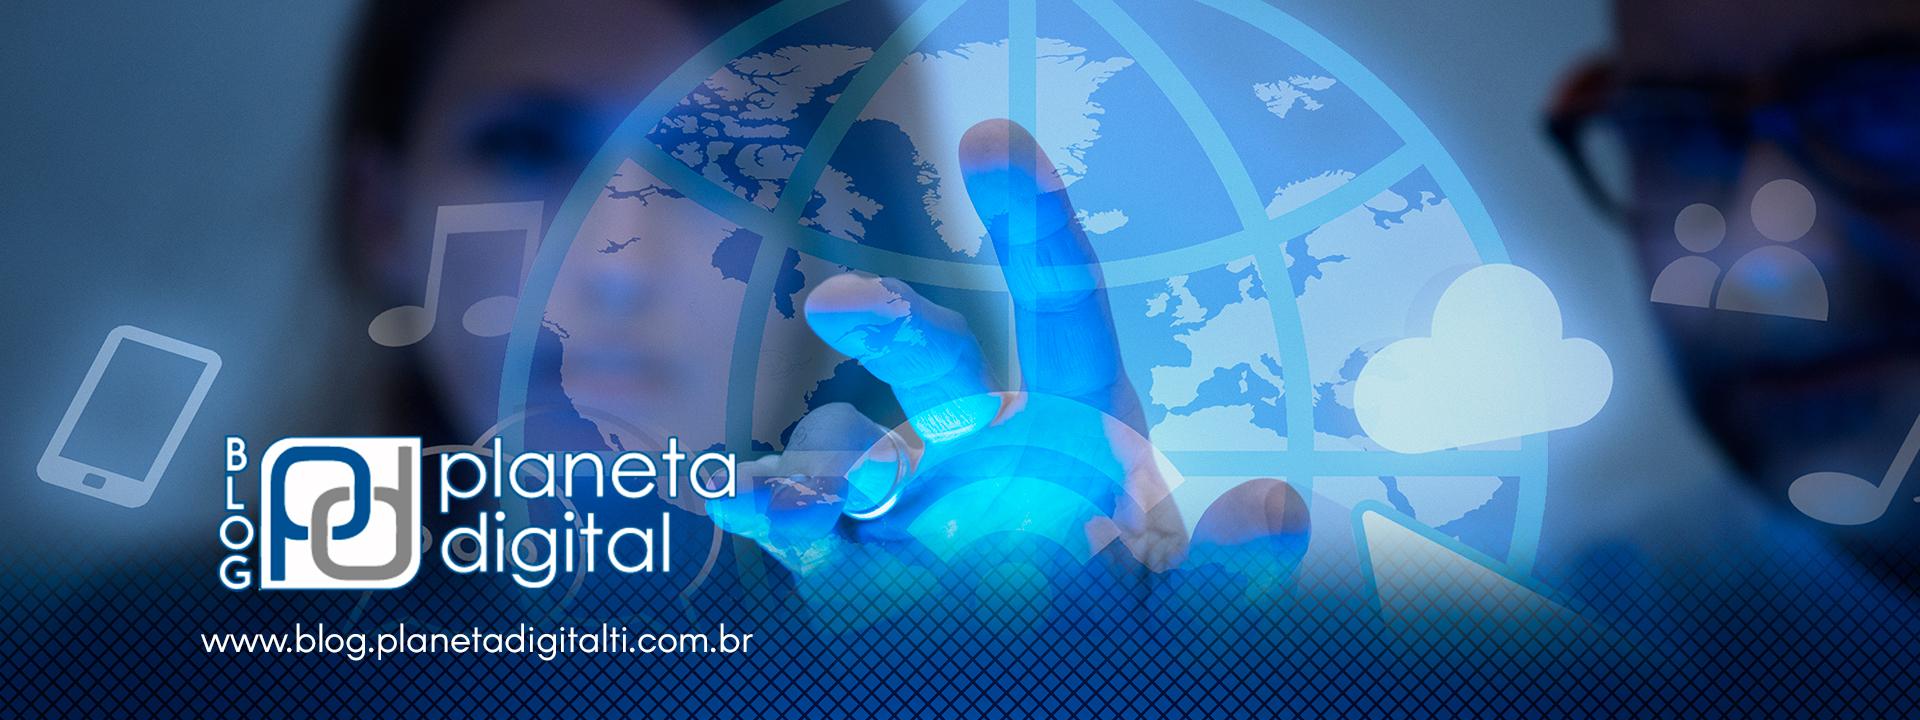 Blog-Planeta_Digital_TI-bg2